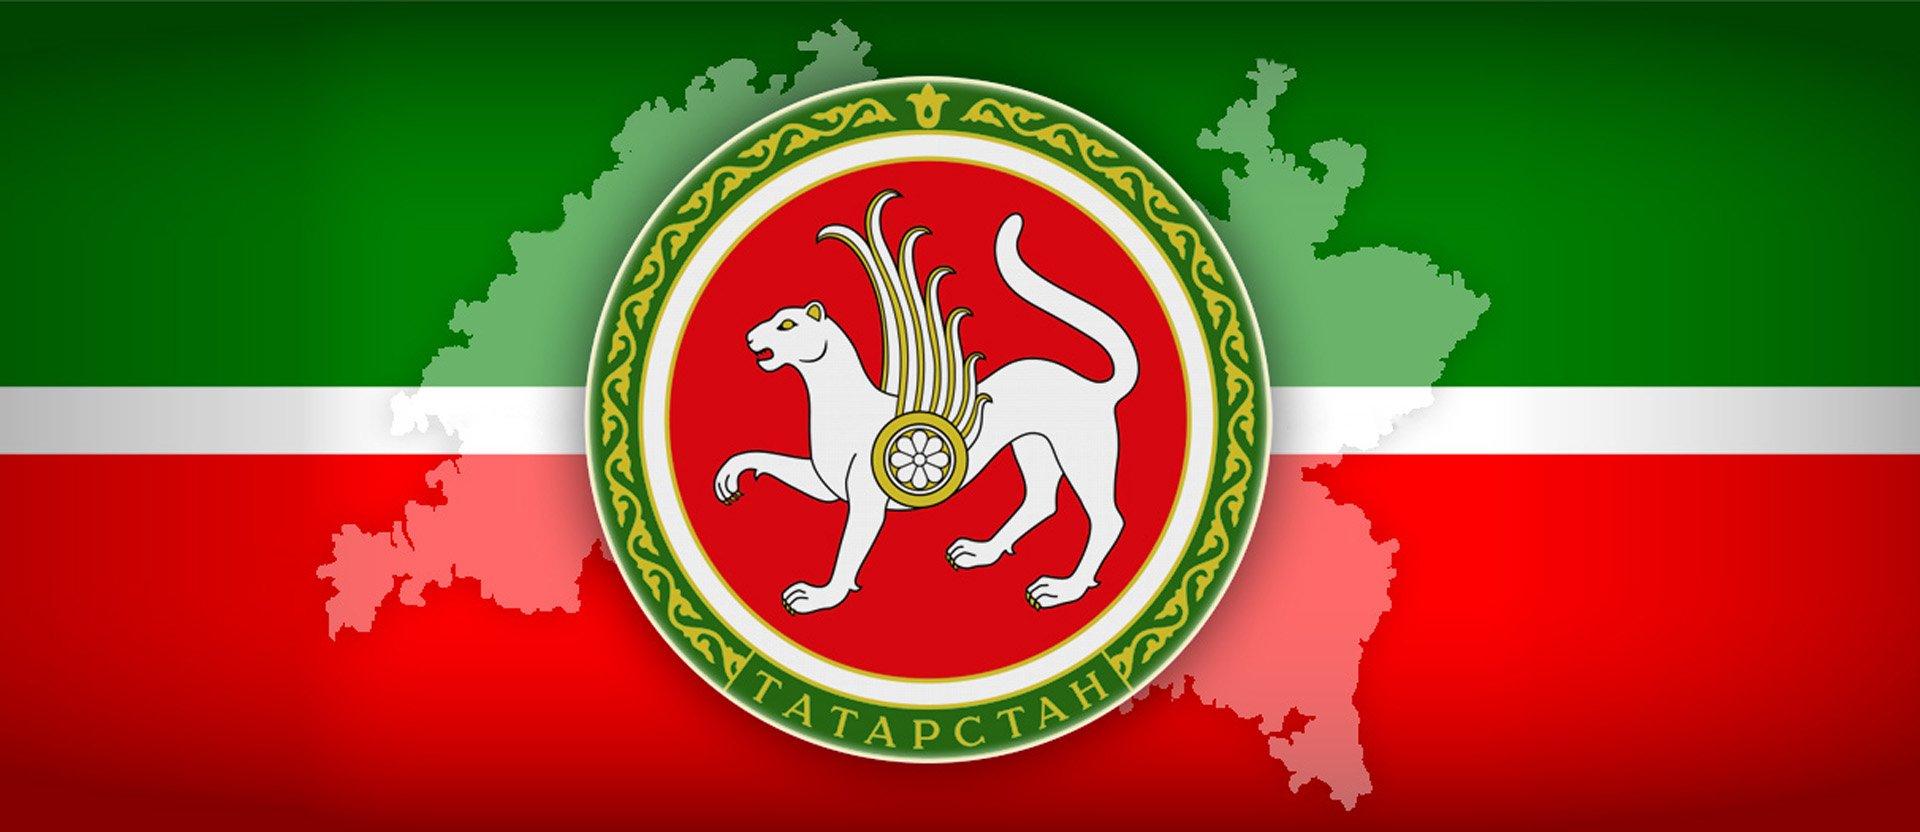 С днем конституции Татарстана